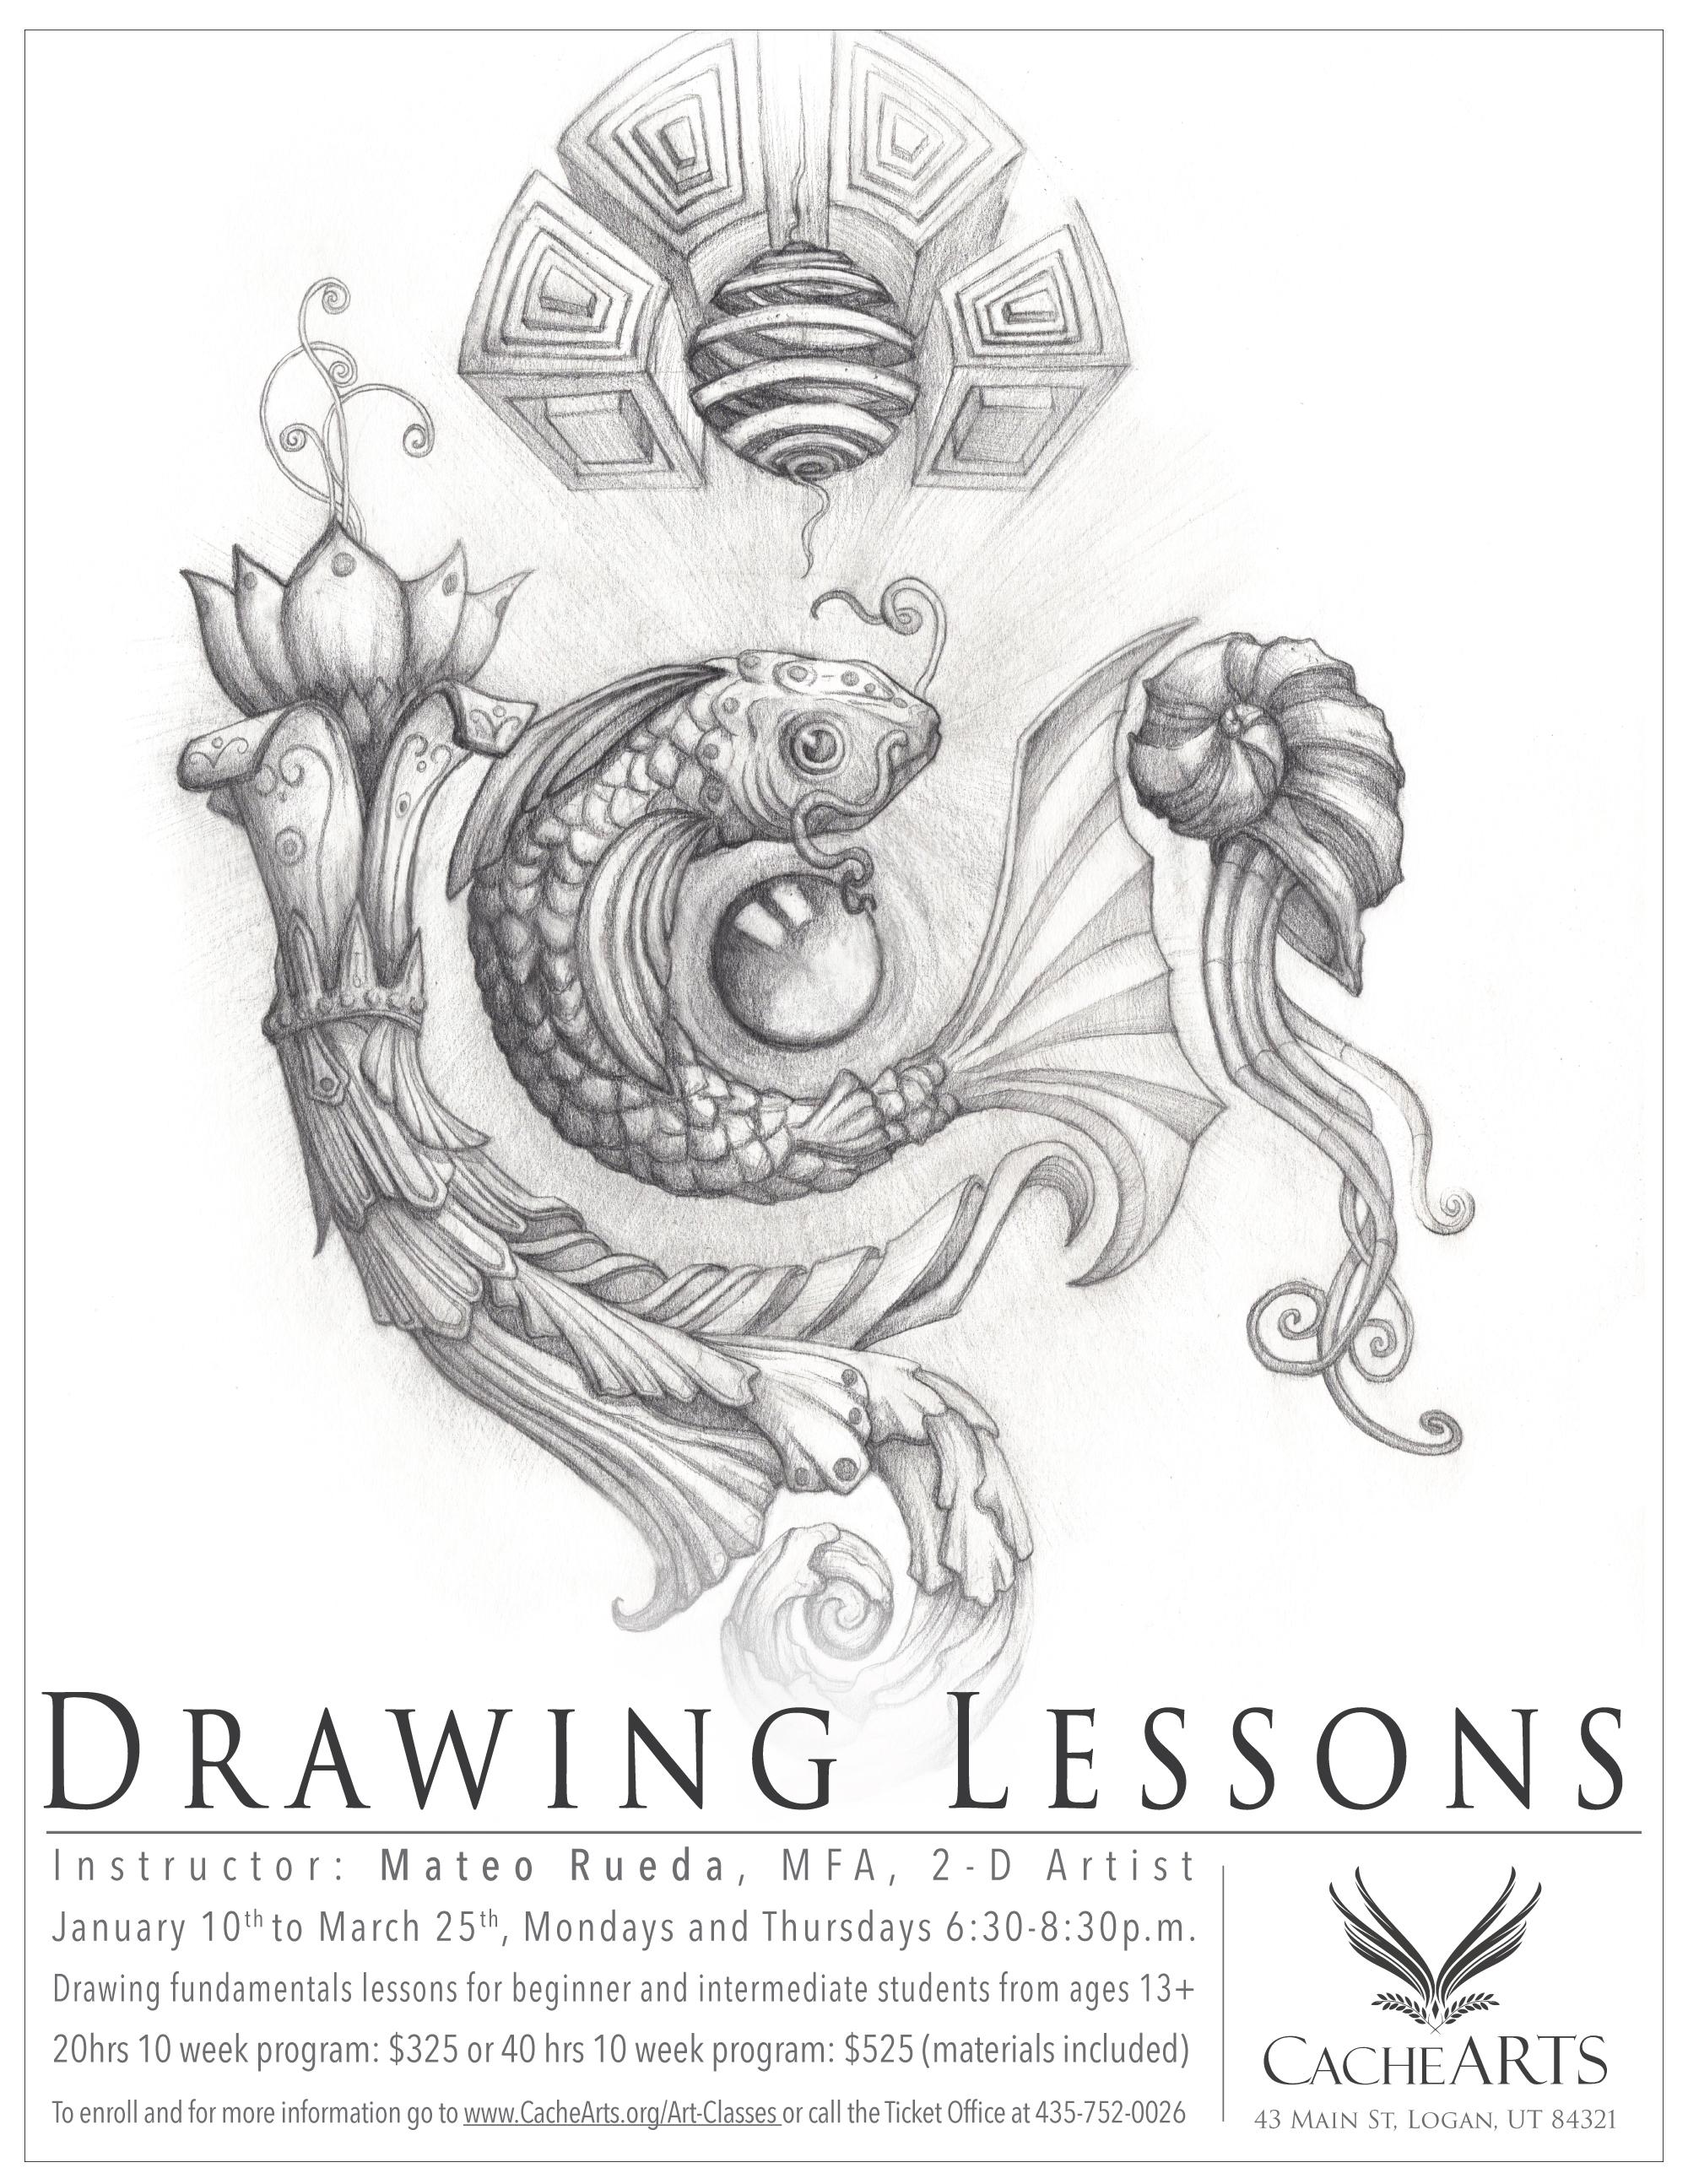 CA-Drawing-lessons-promo.jpg